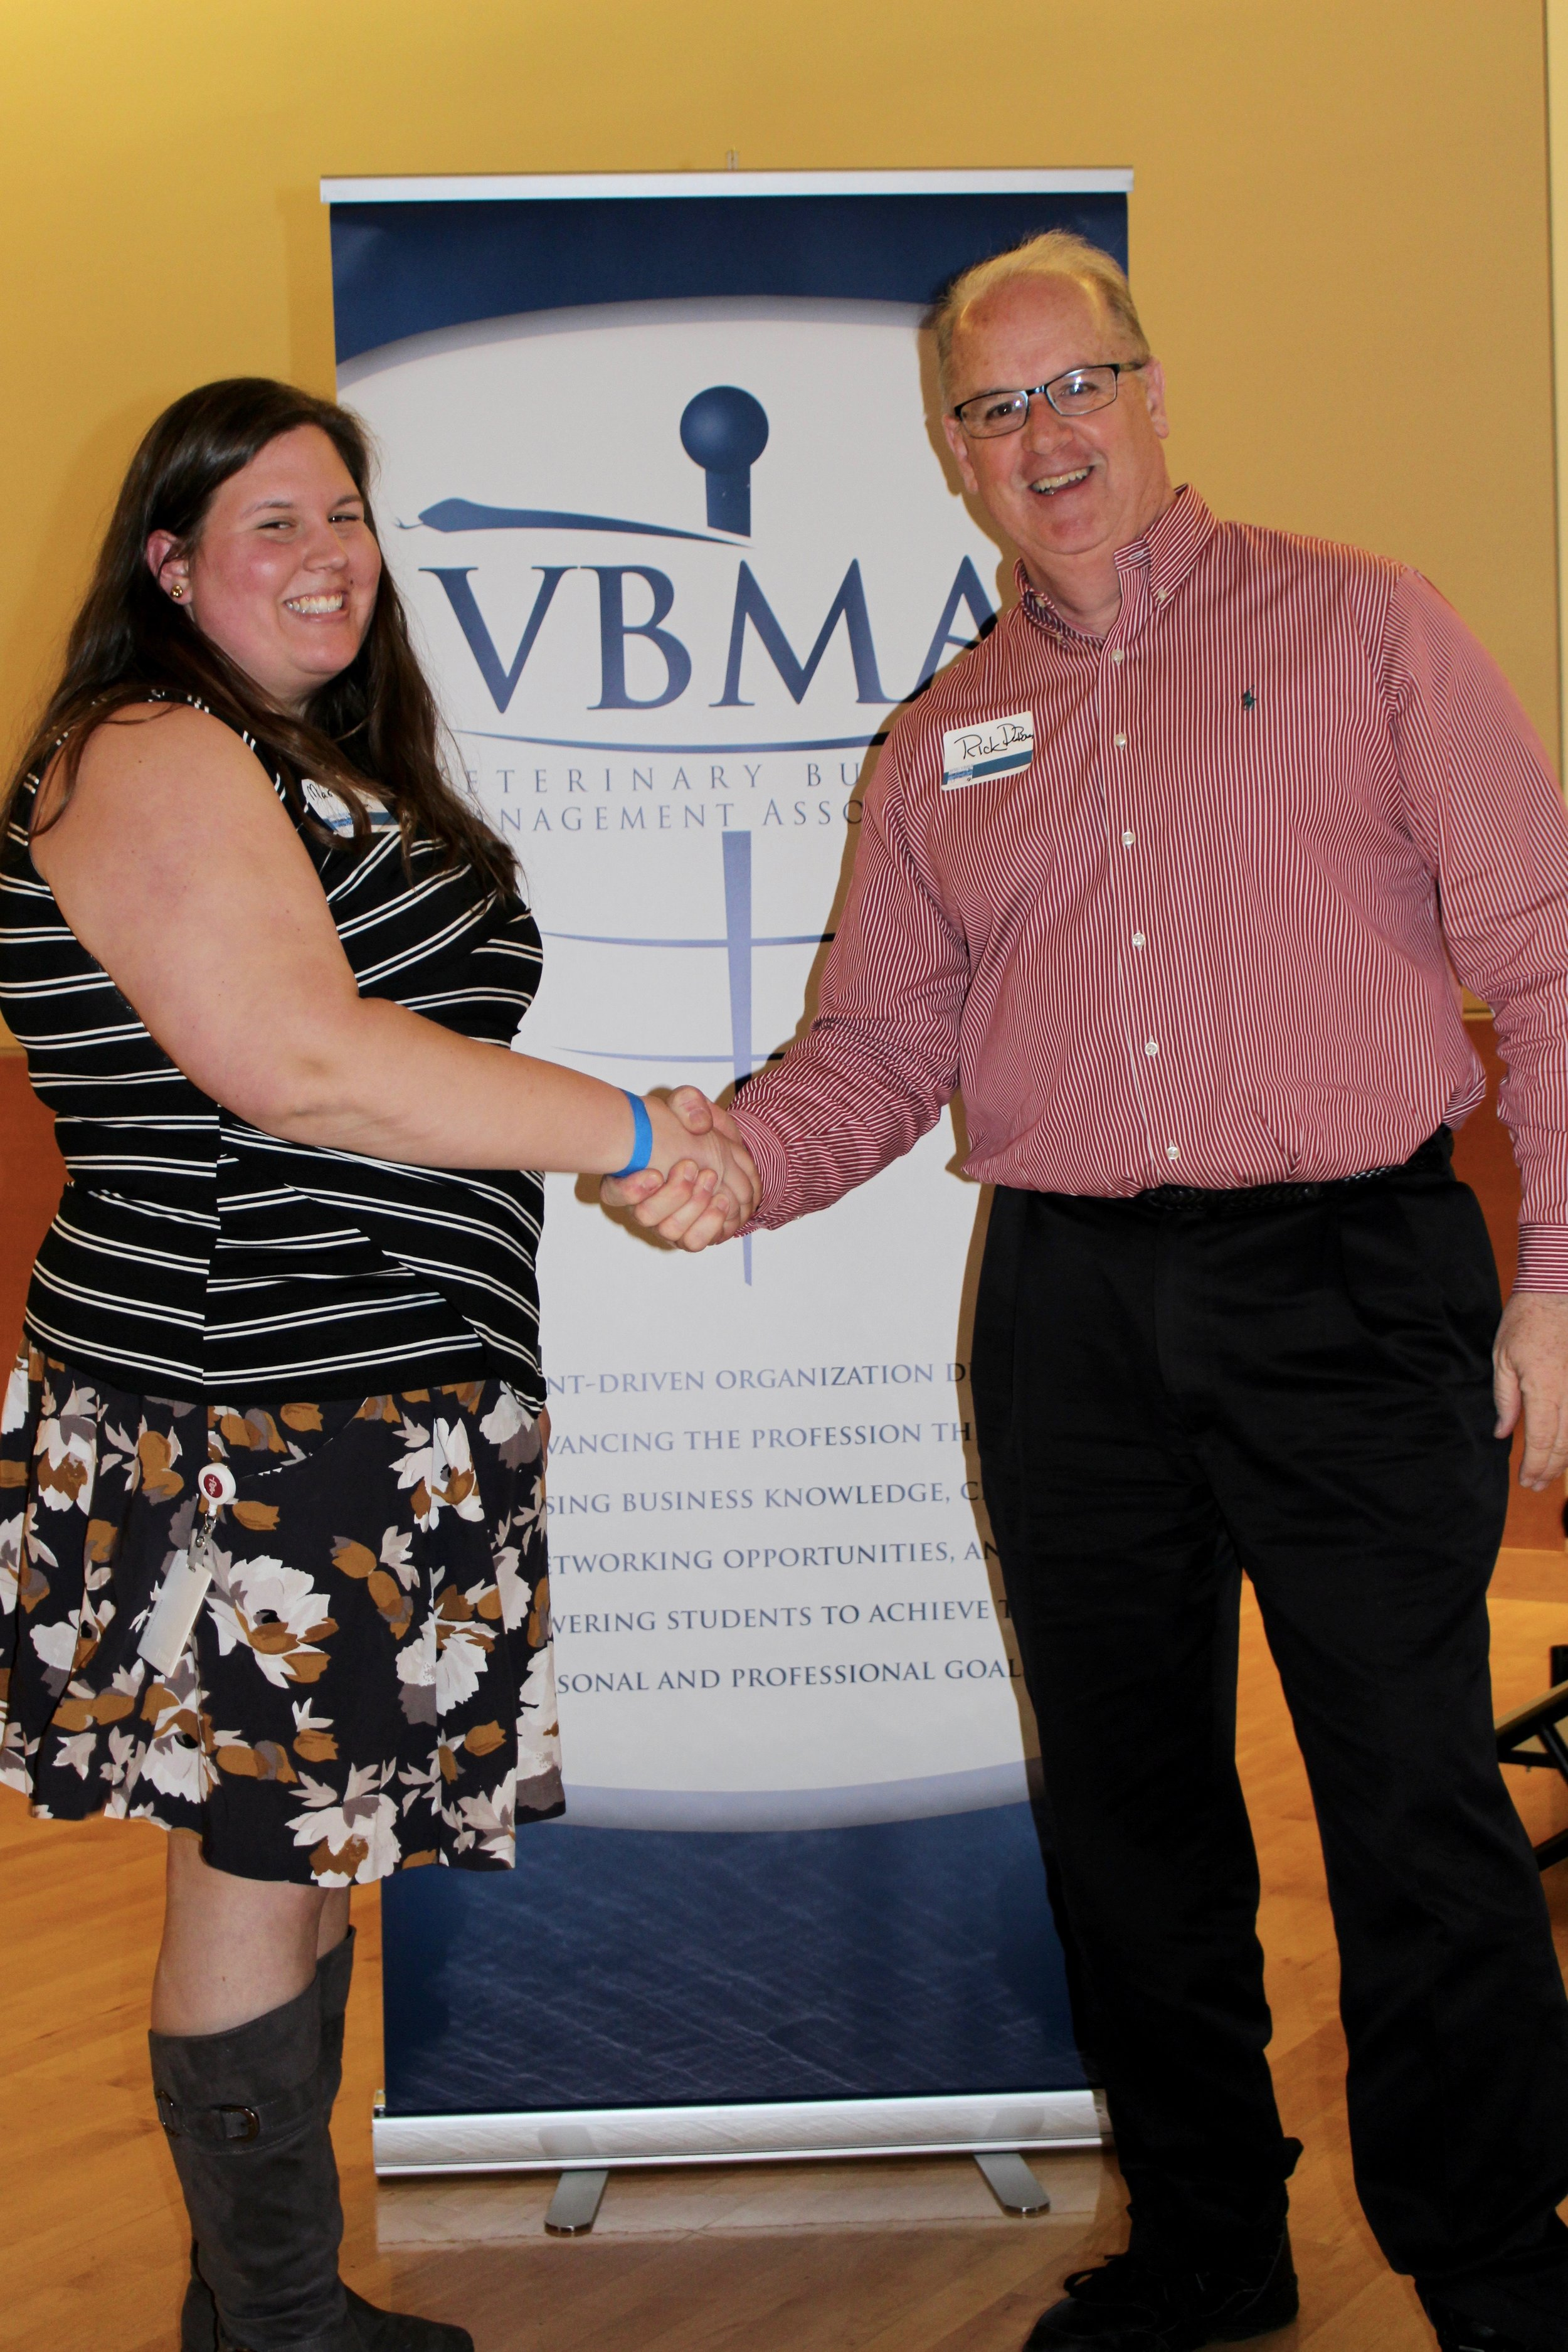 VBMA Partners in Practice - 81 of 129.jpg